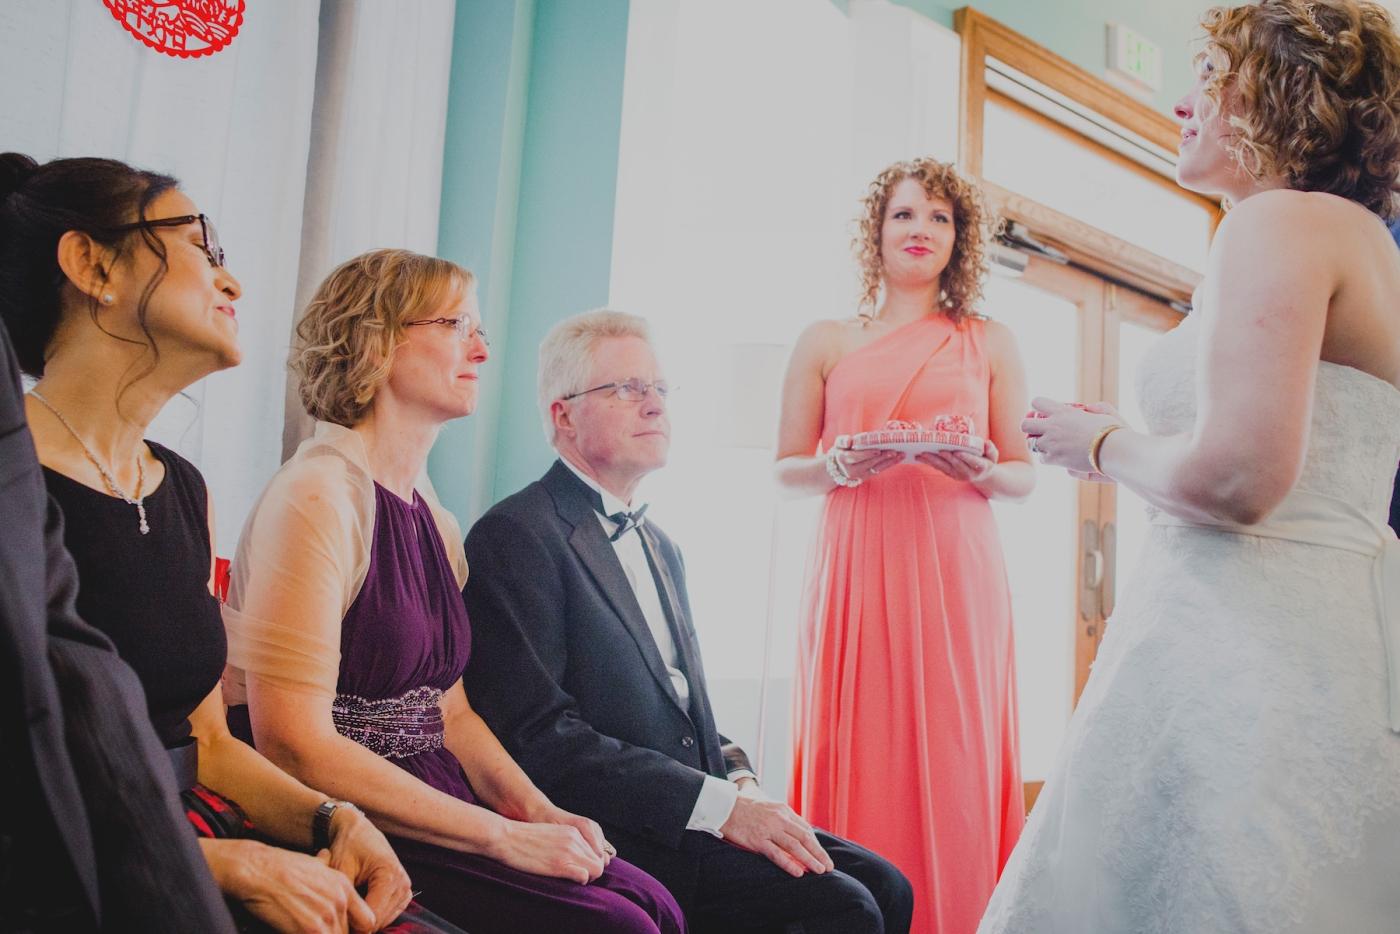 DSC_2987Everett_Wedding_Ballroom_Jane_Speleers_photography_Rachel_and_Edmund_teaceremony_2017